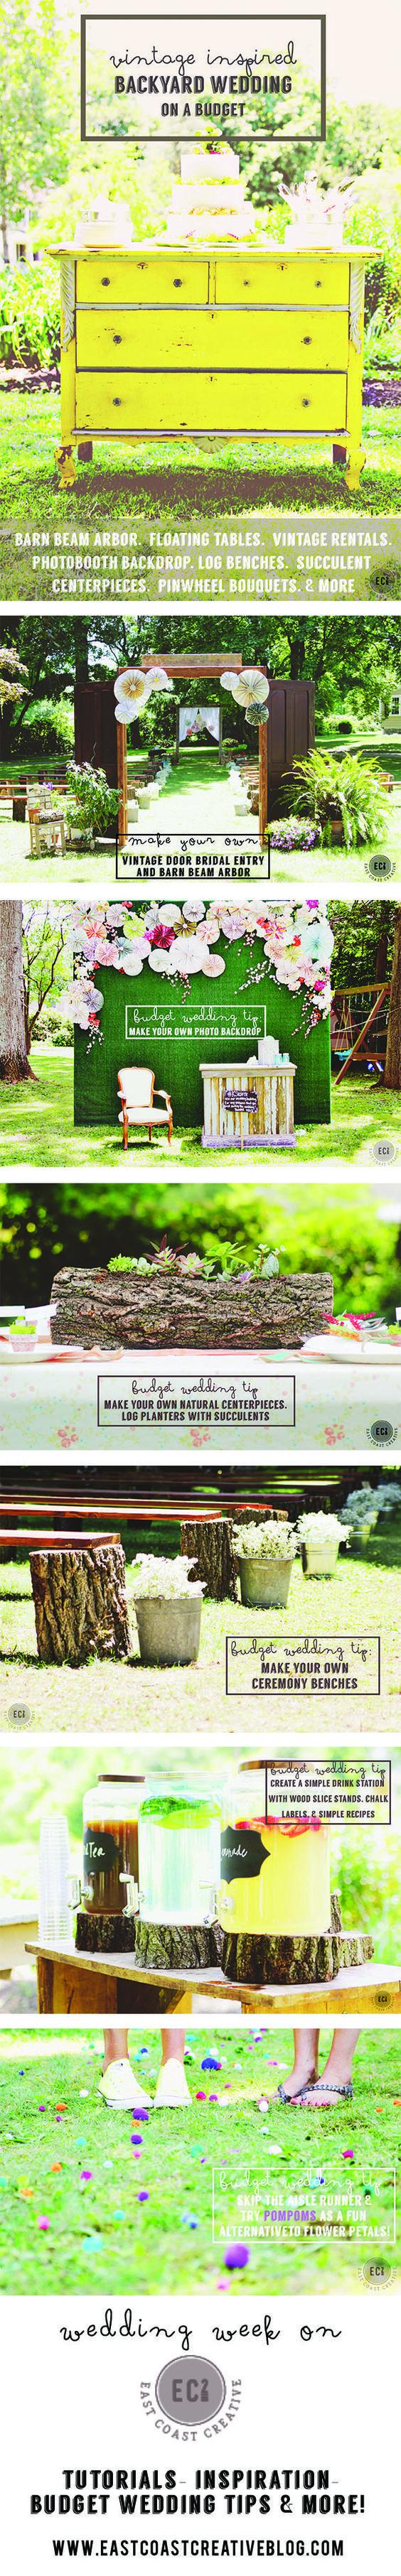 DIY Wedding Ideas on a Budget- Vintage Inspired Backyard Wedding with lots  of tutorials, ideas, and tip… | Diy backyard wedding, Backyard wedding,  Wedding hacks diy